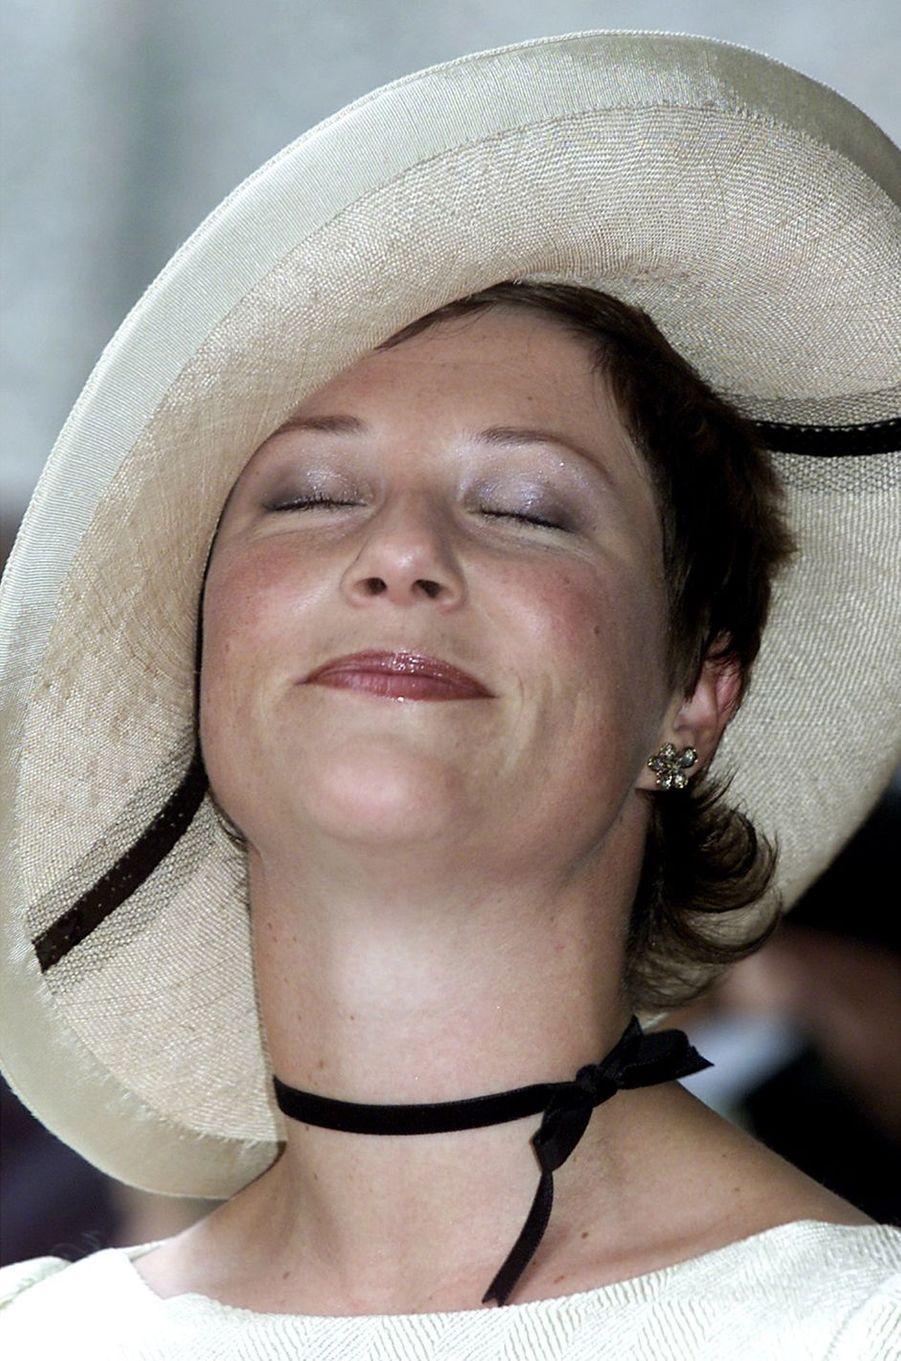 La princesse Märtha Louise de Norvège, le 25 août 2001